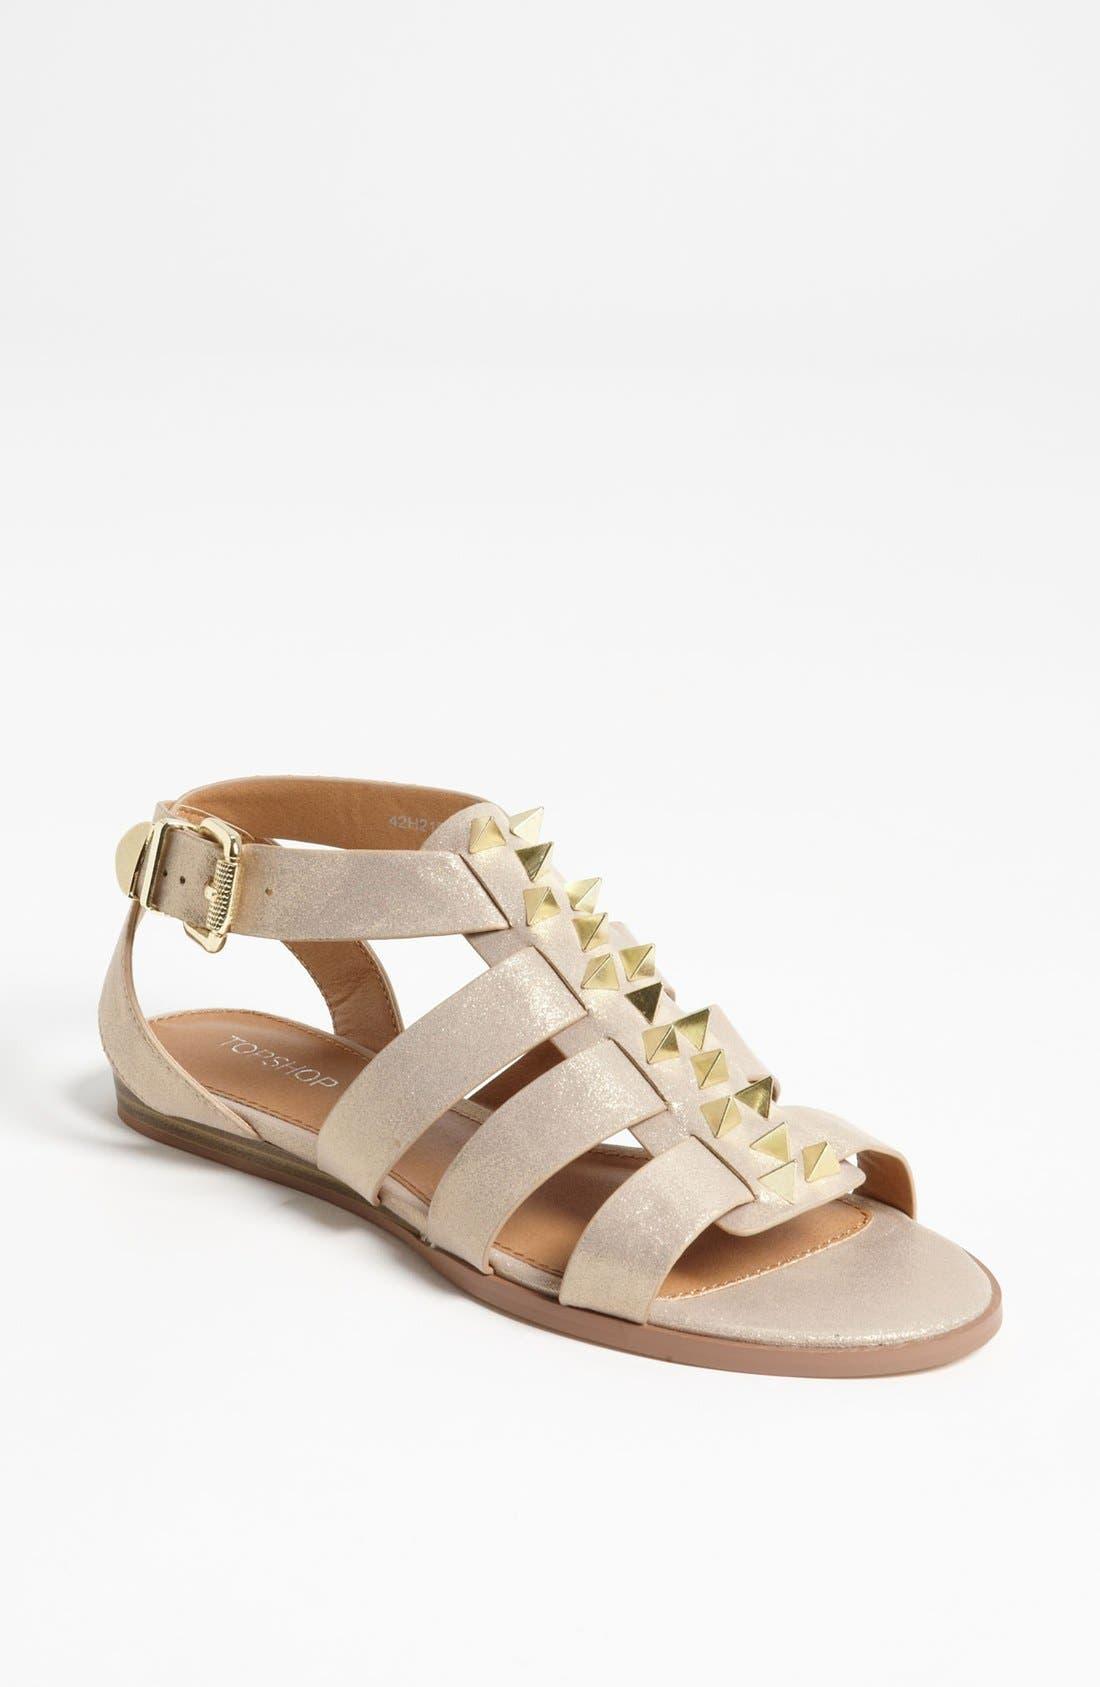 Alternate Image 1 Selected - Topshop 'Hope Stud' Gladiator Sandal